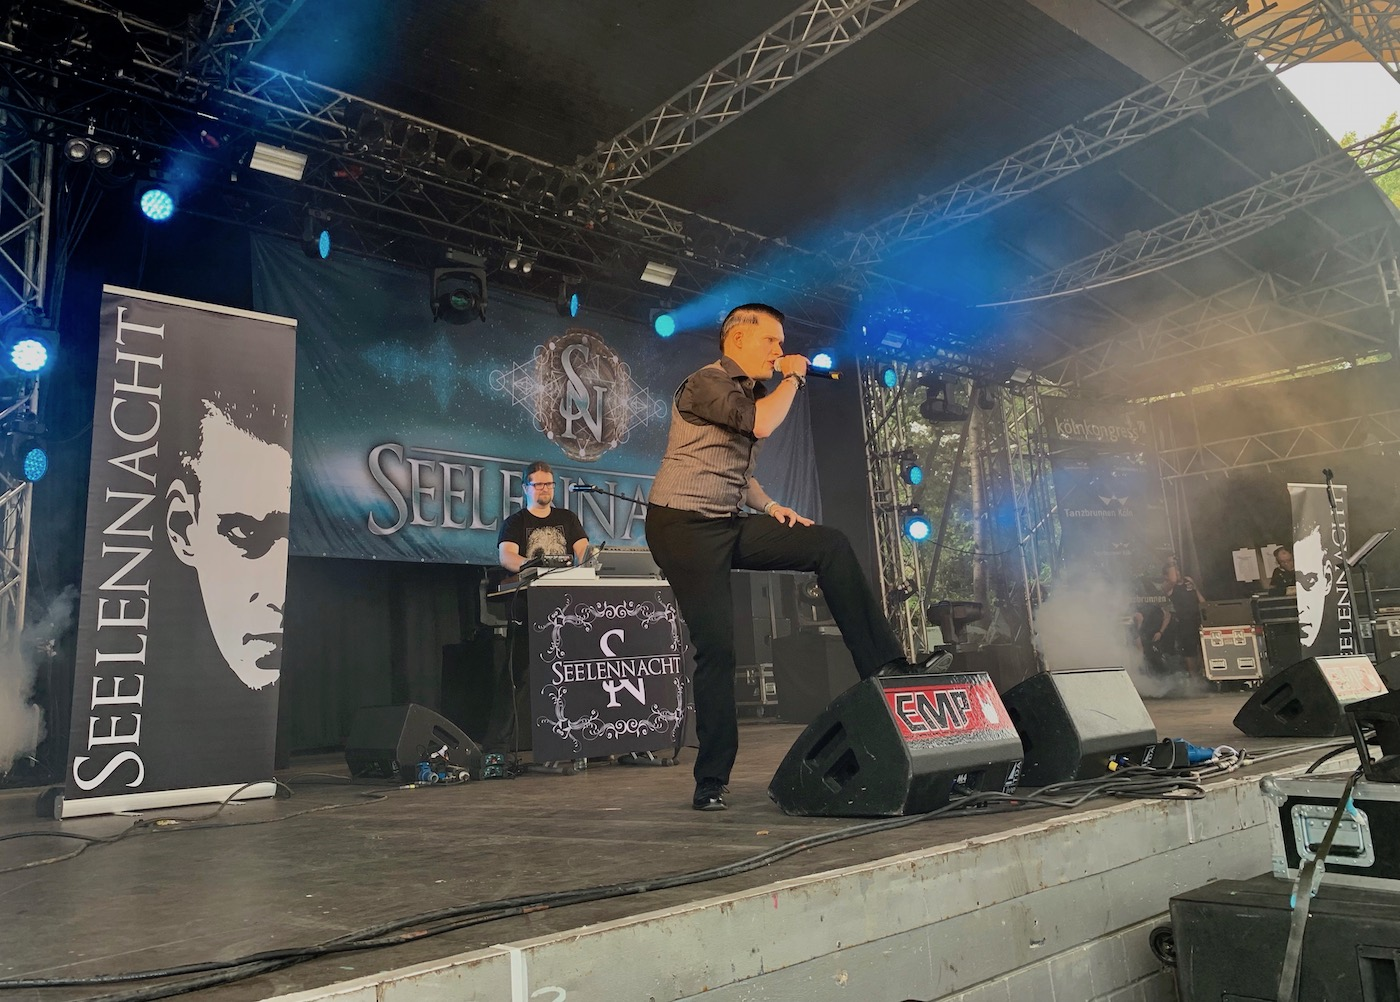 mark_benecke_amphi_festival_koeln_2019 - 7.jpg